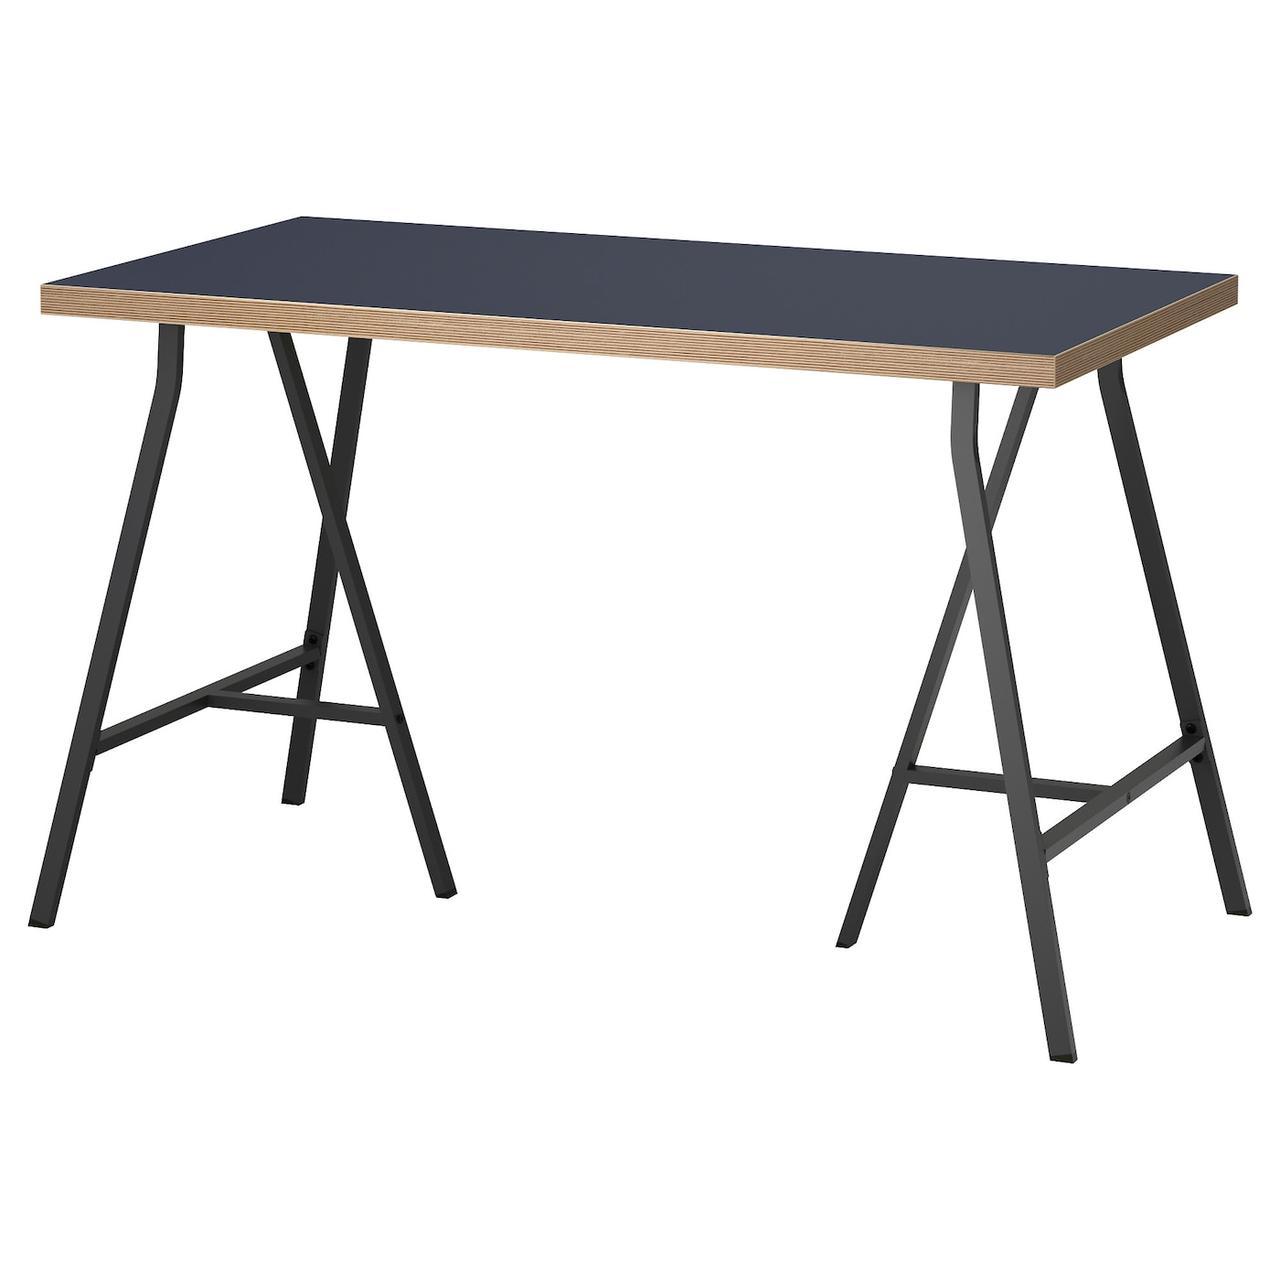 Компьютерный стол IKEA LINNMON / LERBERG синий, серый 120x60 см 392.142.84